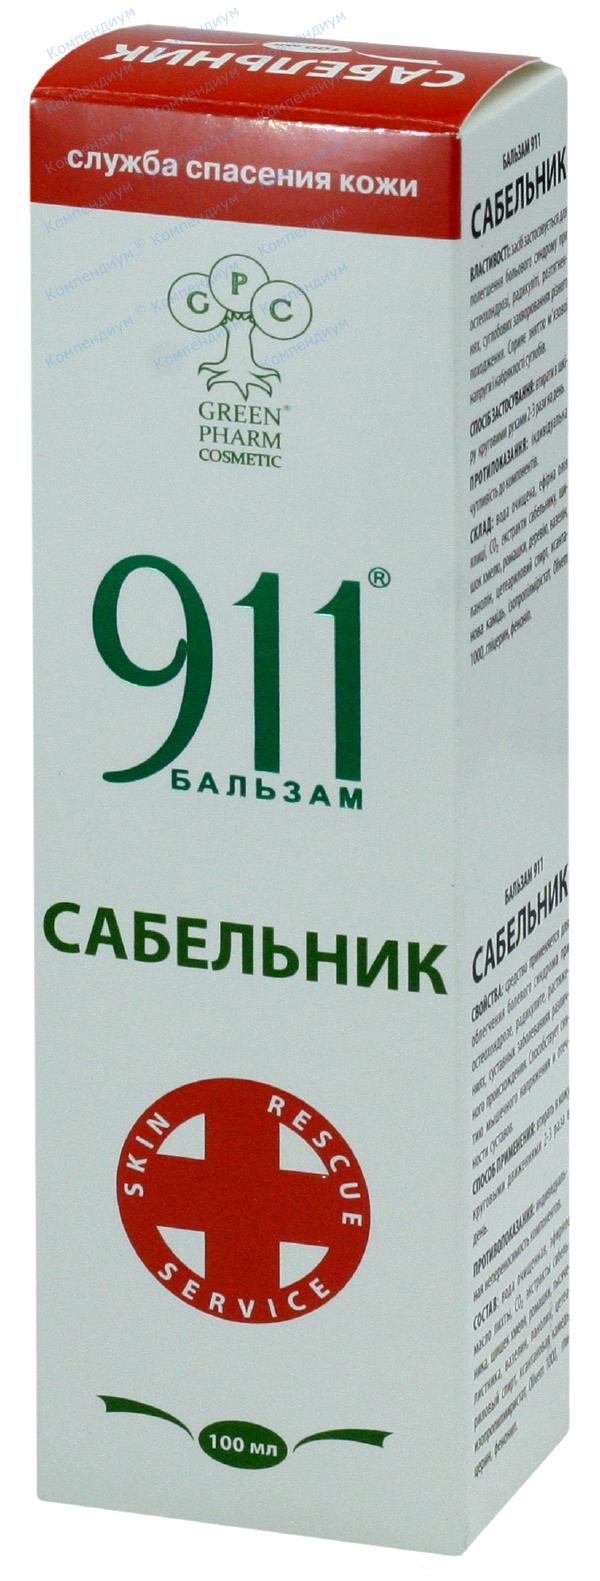 911 бальзам сабельник 100 мл